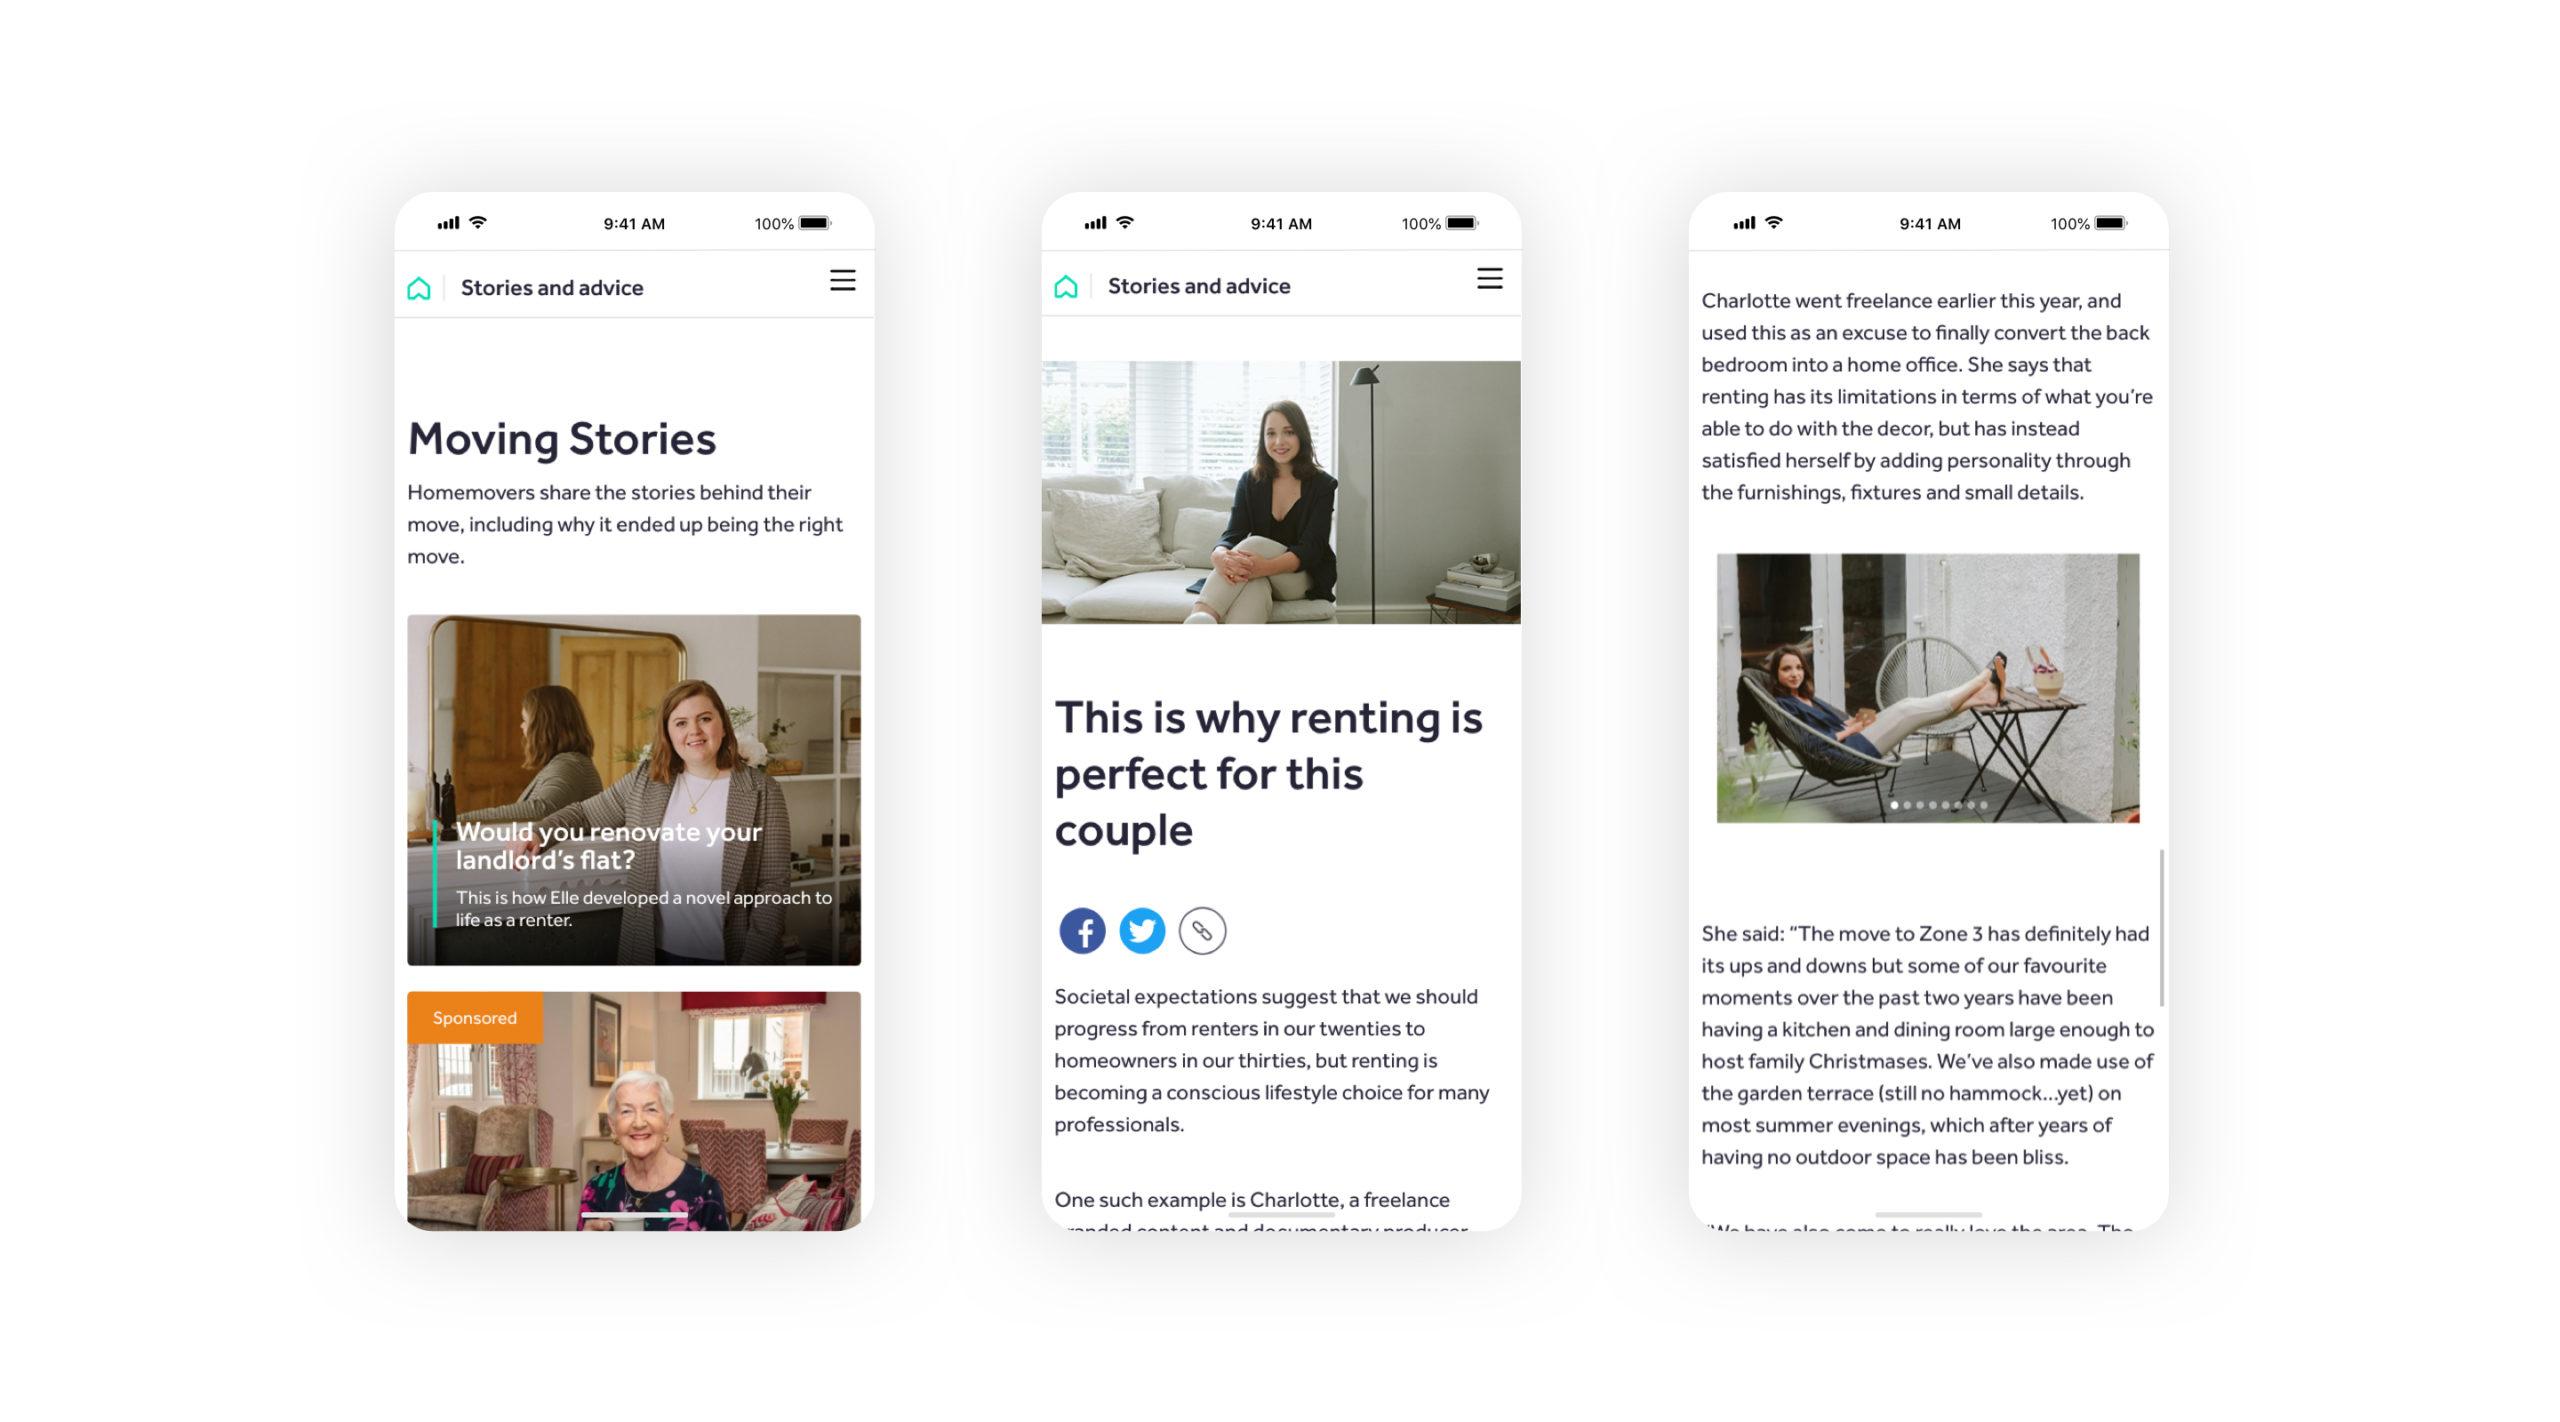 rightmove moving stories screenshot